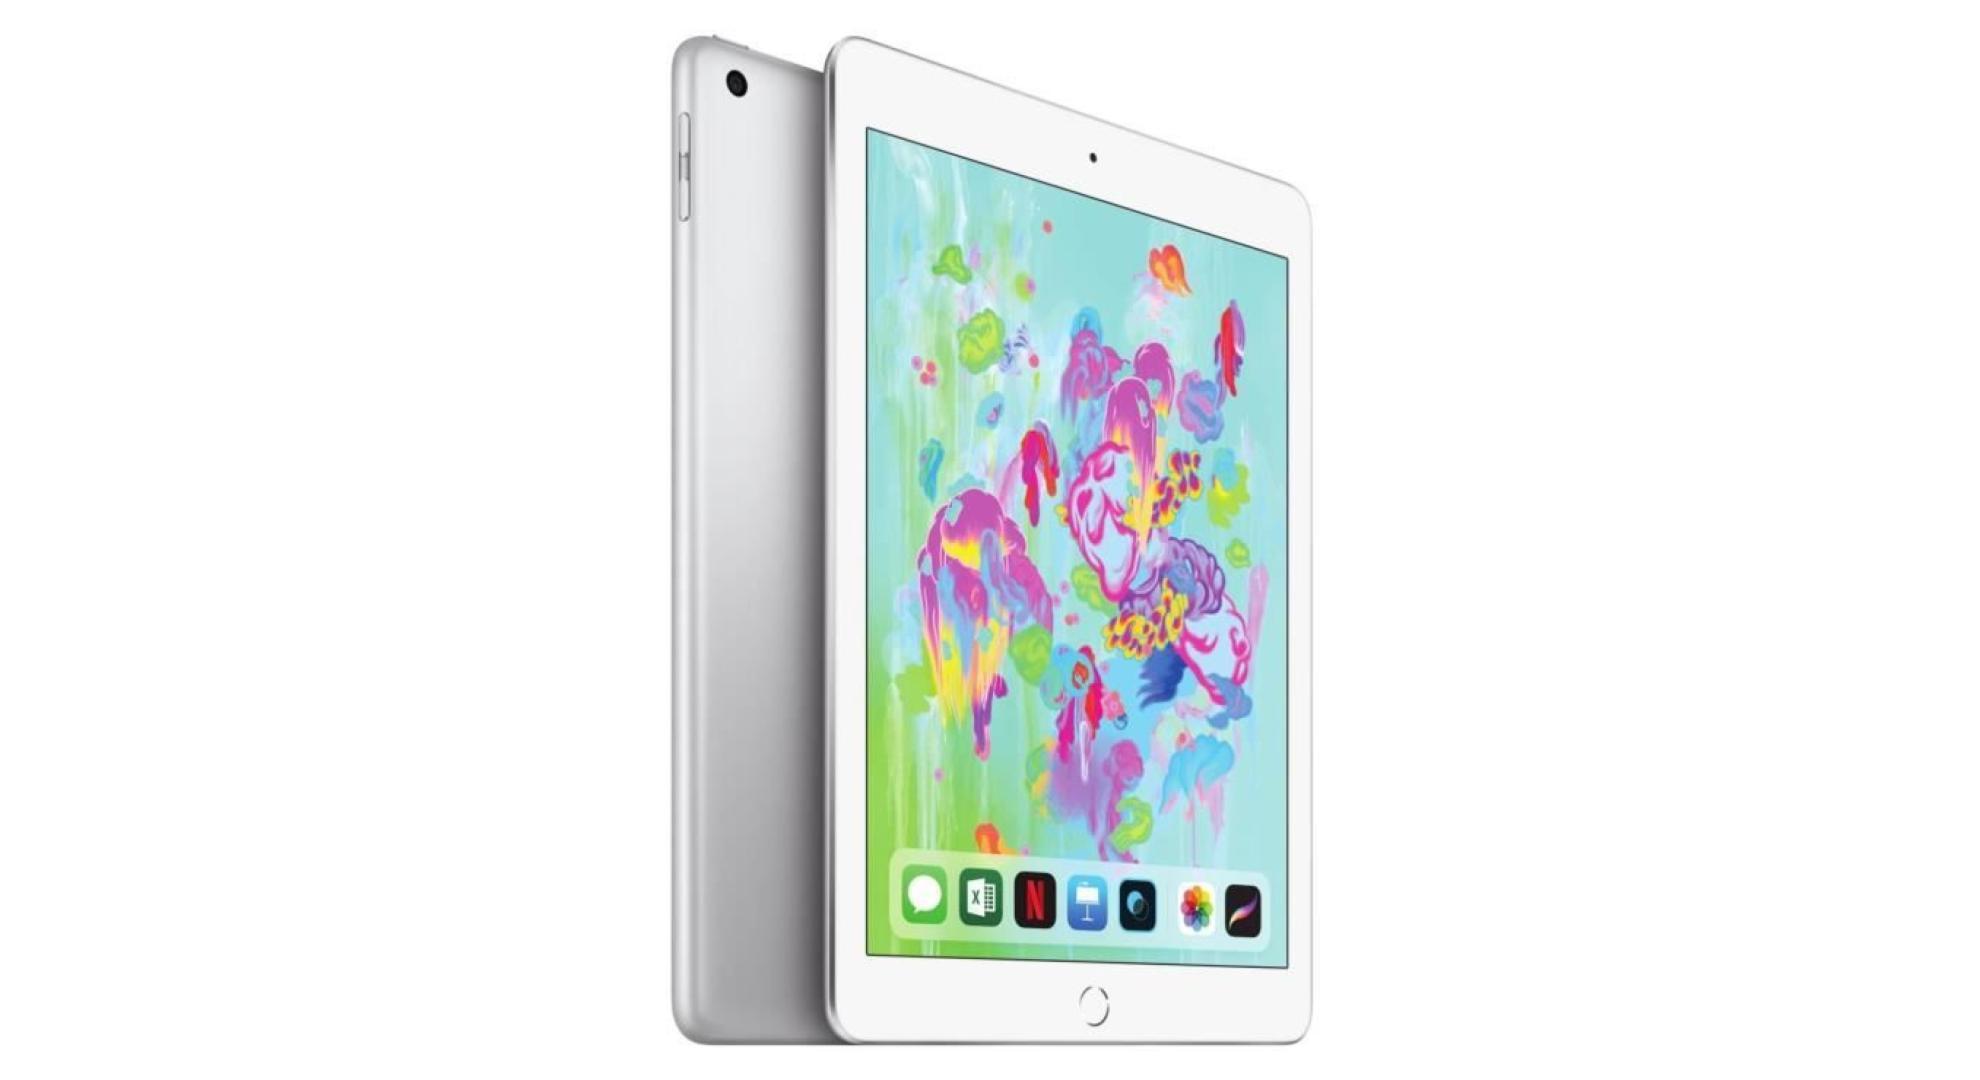 🔥 Soldes 2019 : l'iPad 2018 (compatible avec iPad OS) est à 299 euros